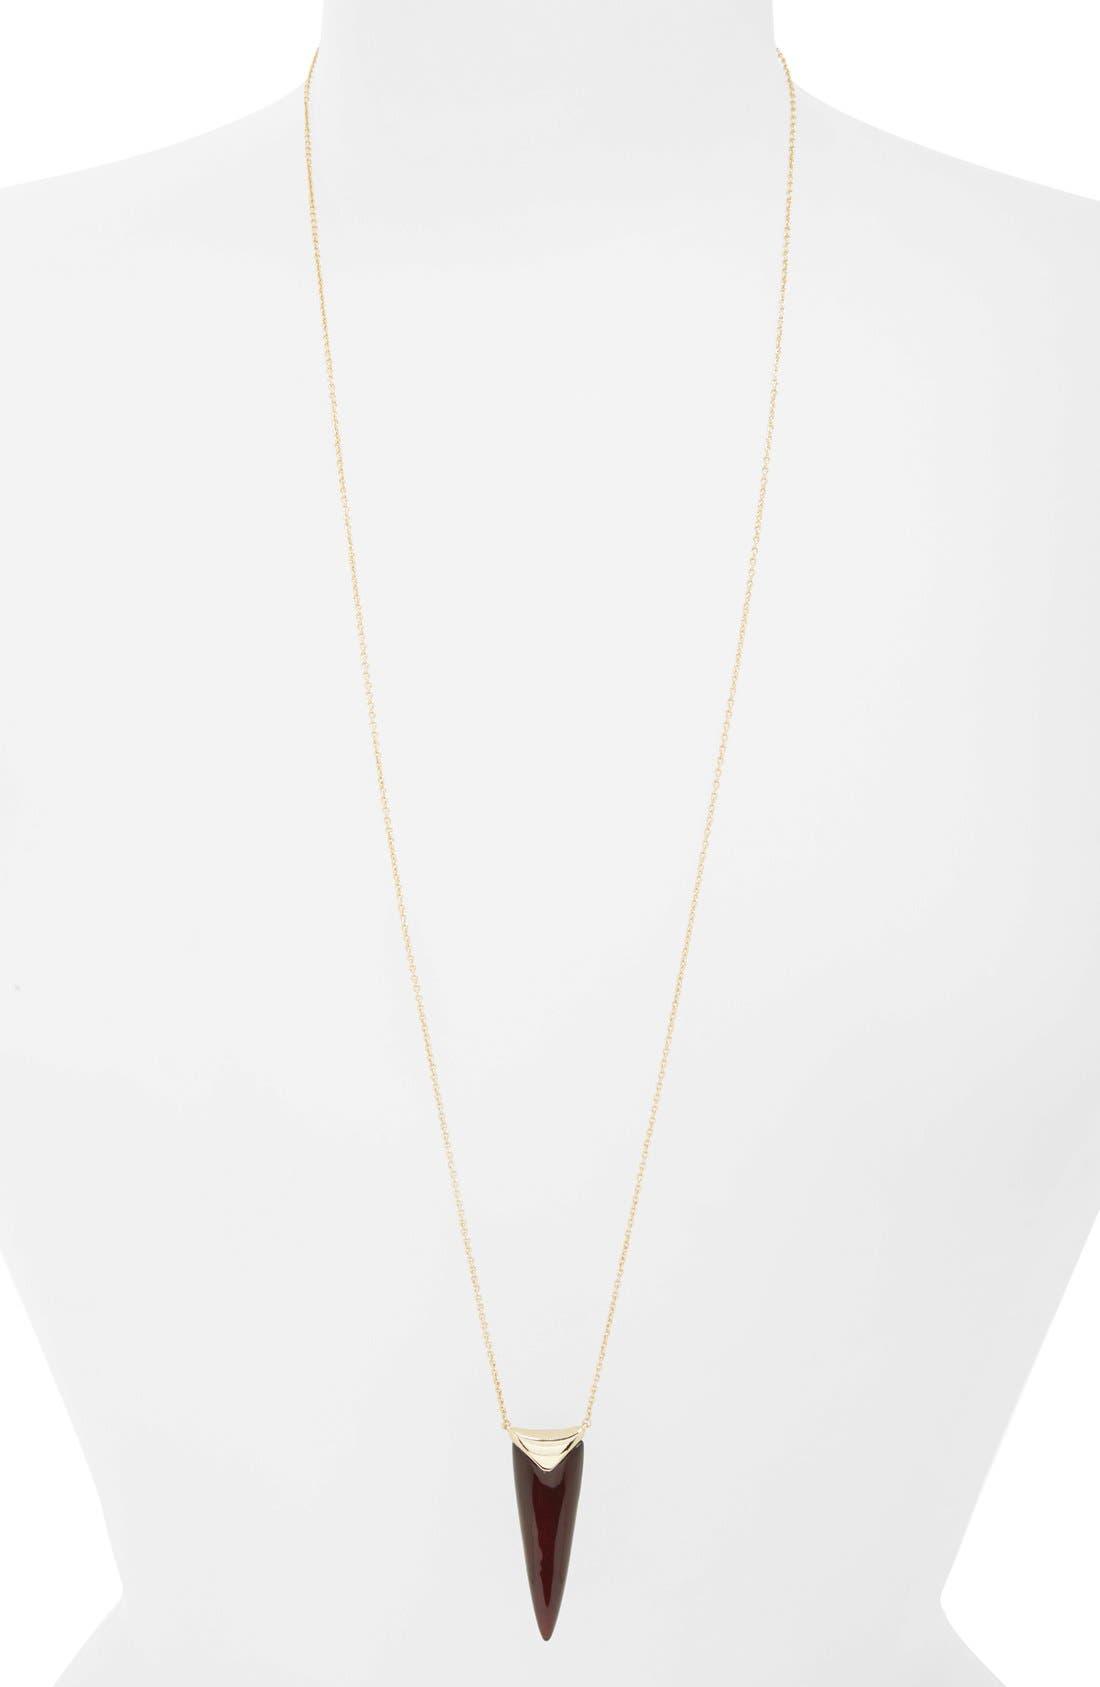 Main Image - Alexis Bittar 'Lucite®' Pendant Necklace